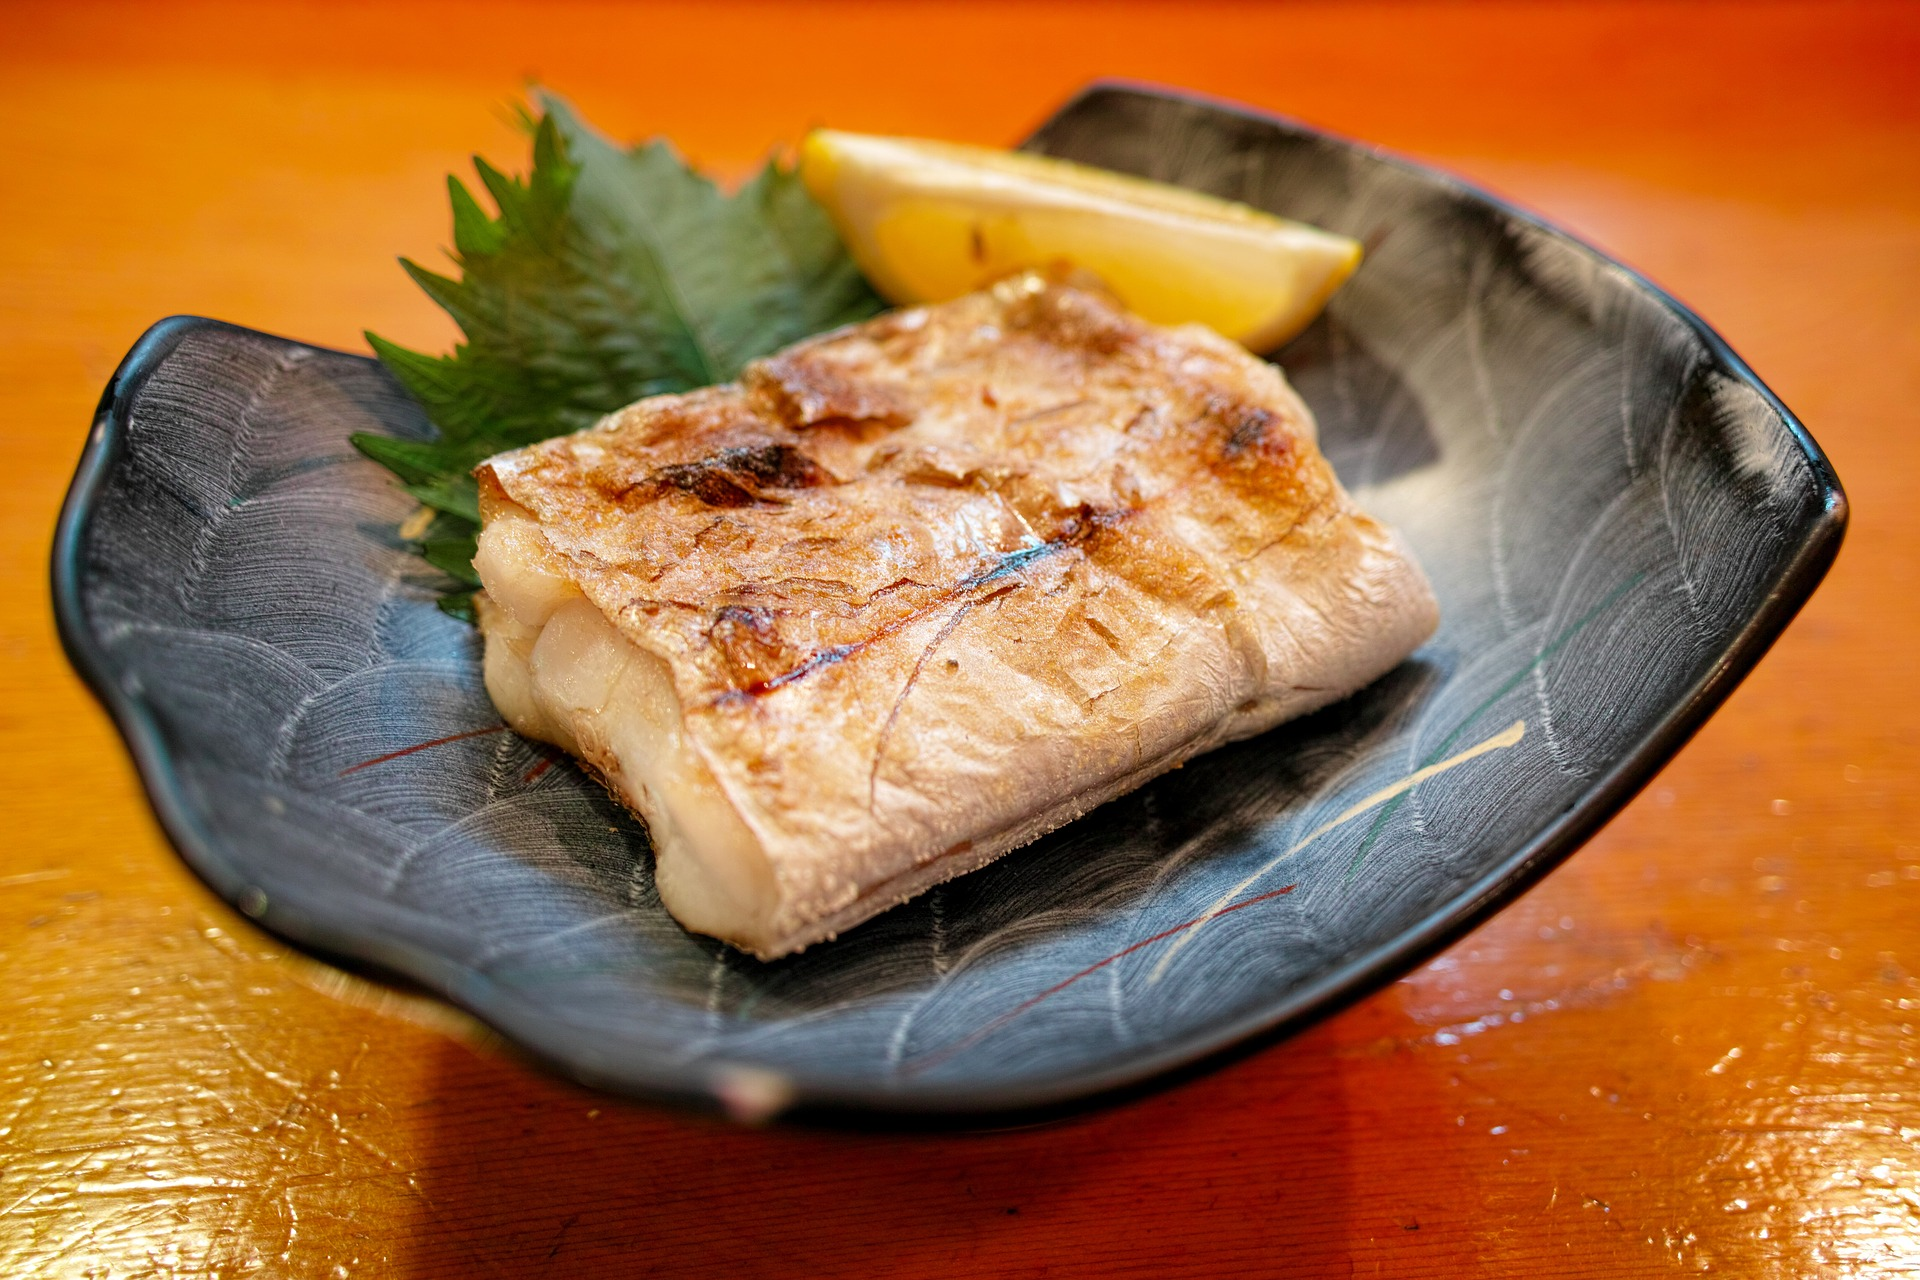 Consumir pescado pero con seguridad aizea for Criadero de pescado